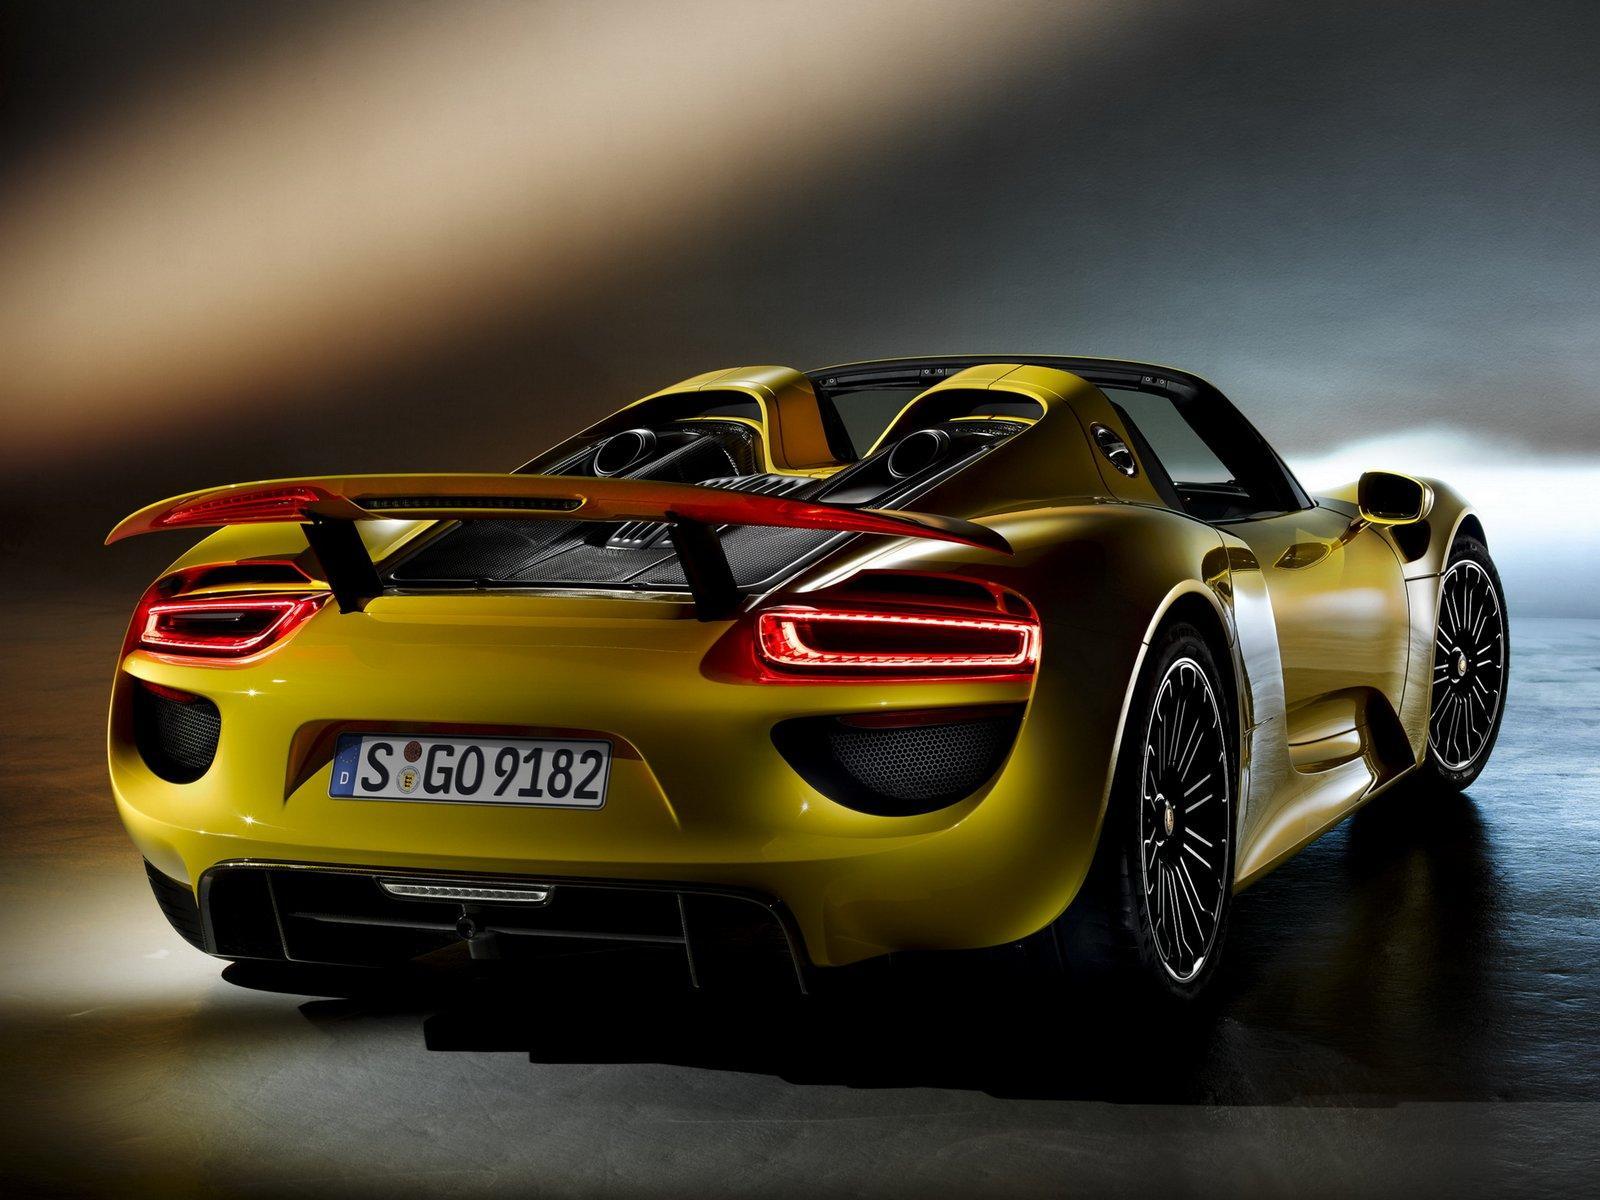 Yellow Porsche 918 Spyder Looks Amazing - GTspirit